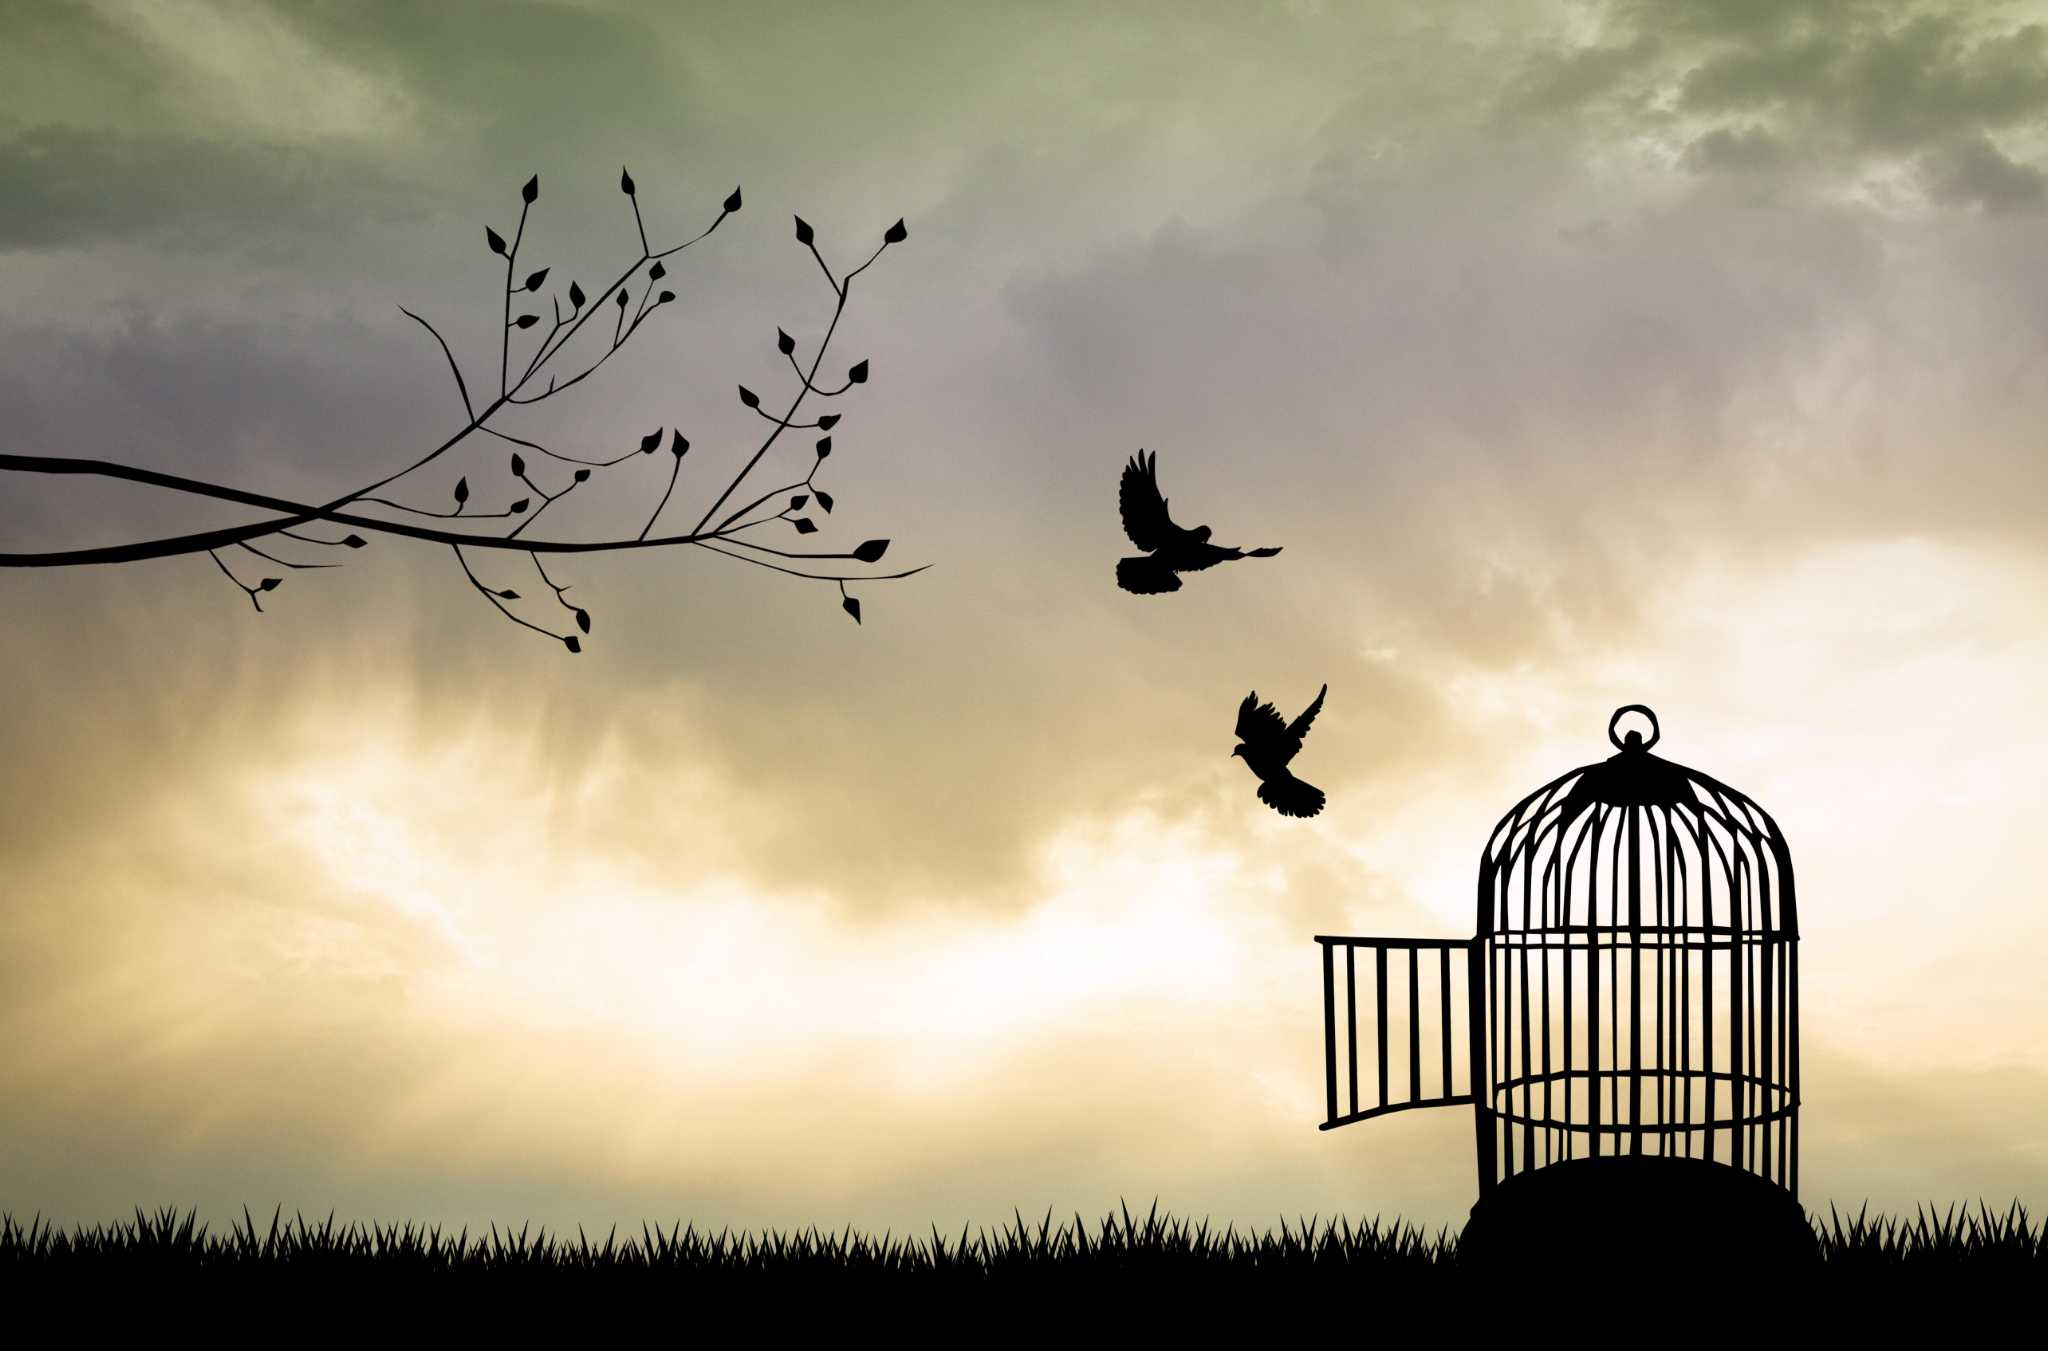 Özgür Düşünce